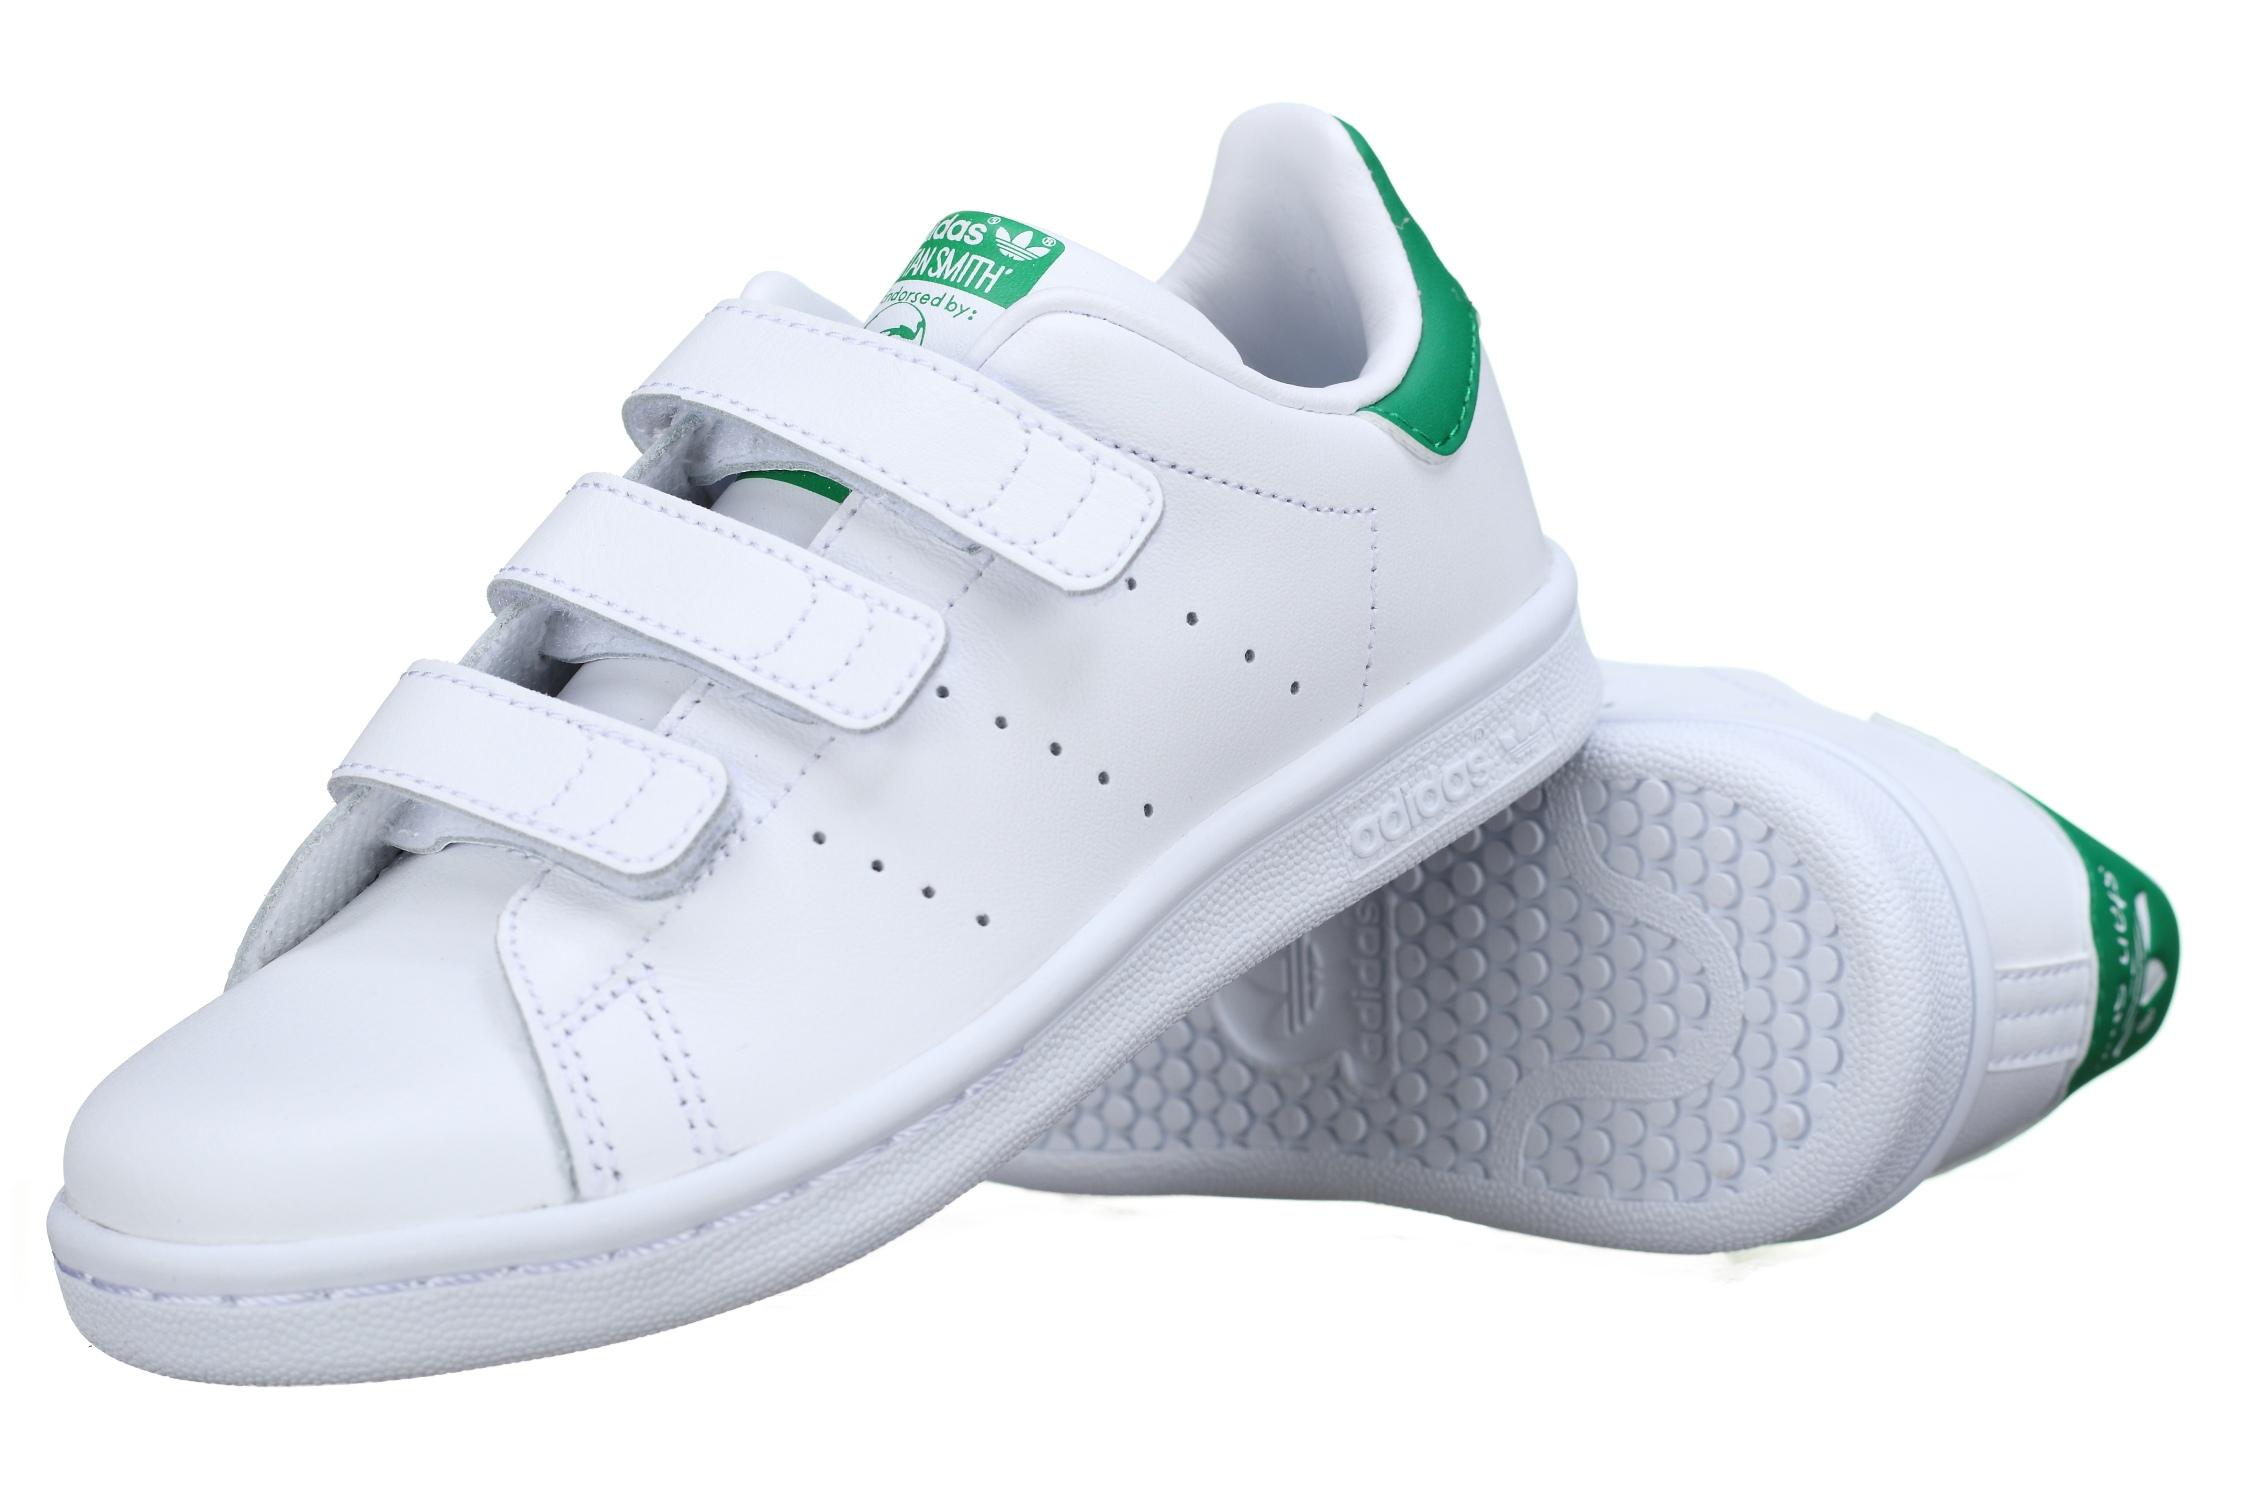 https://www.leadermode.com/137722/adidas-stan-smith-cf-c-m20607-blanc-vert.jpg